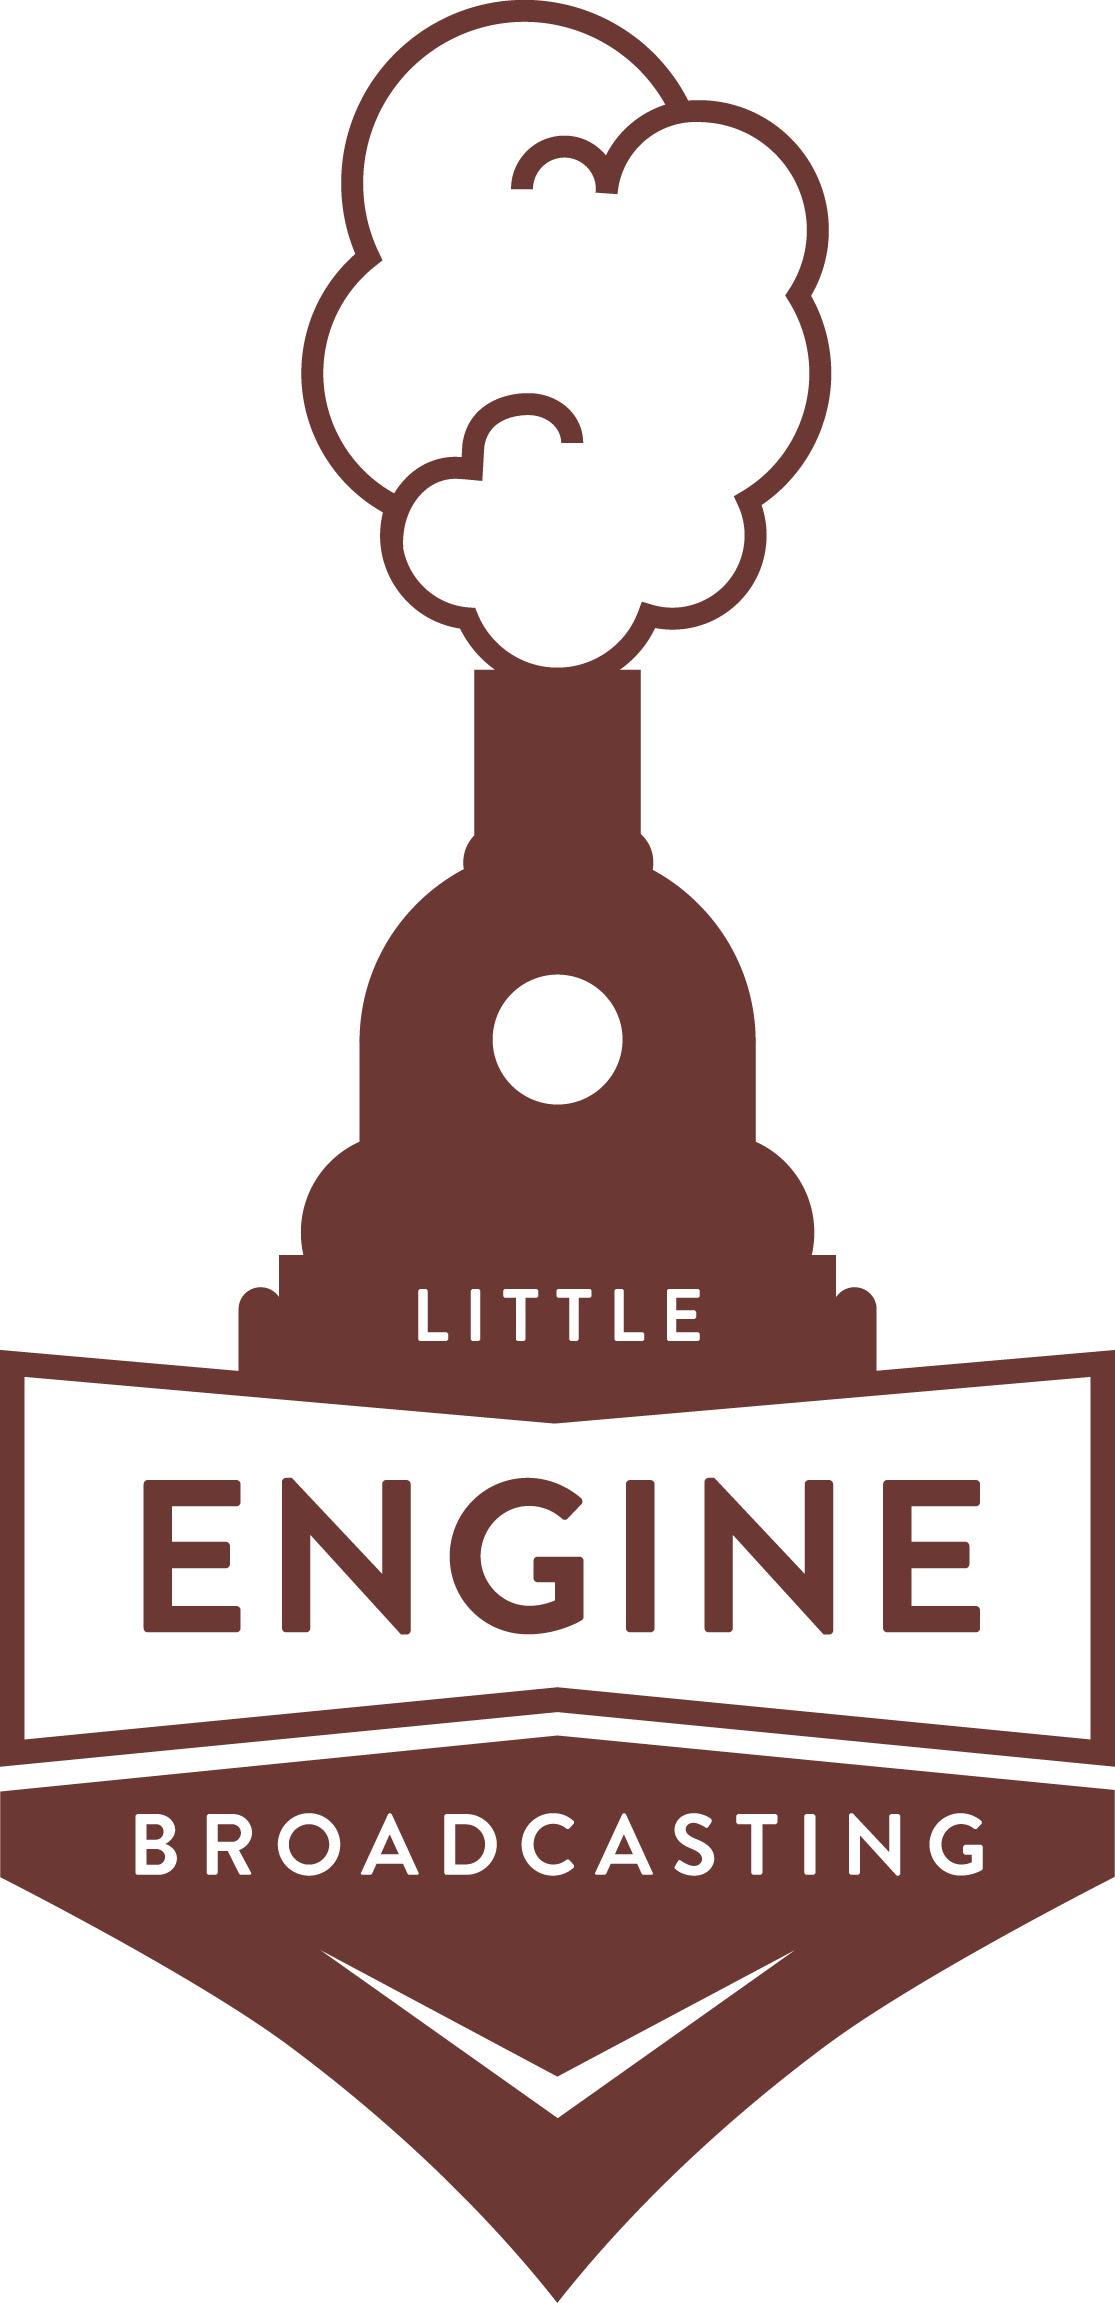 Little Engine Broadcasting.jpg